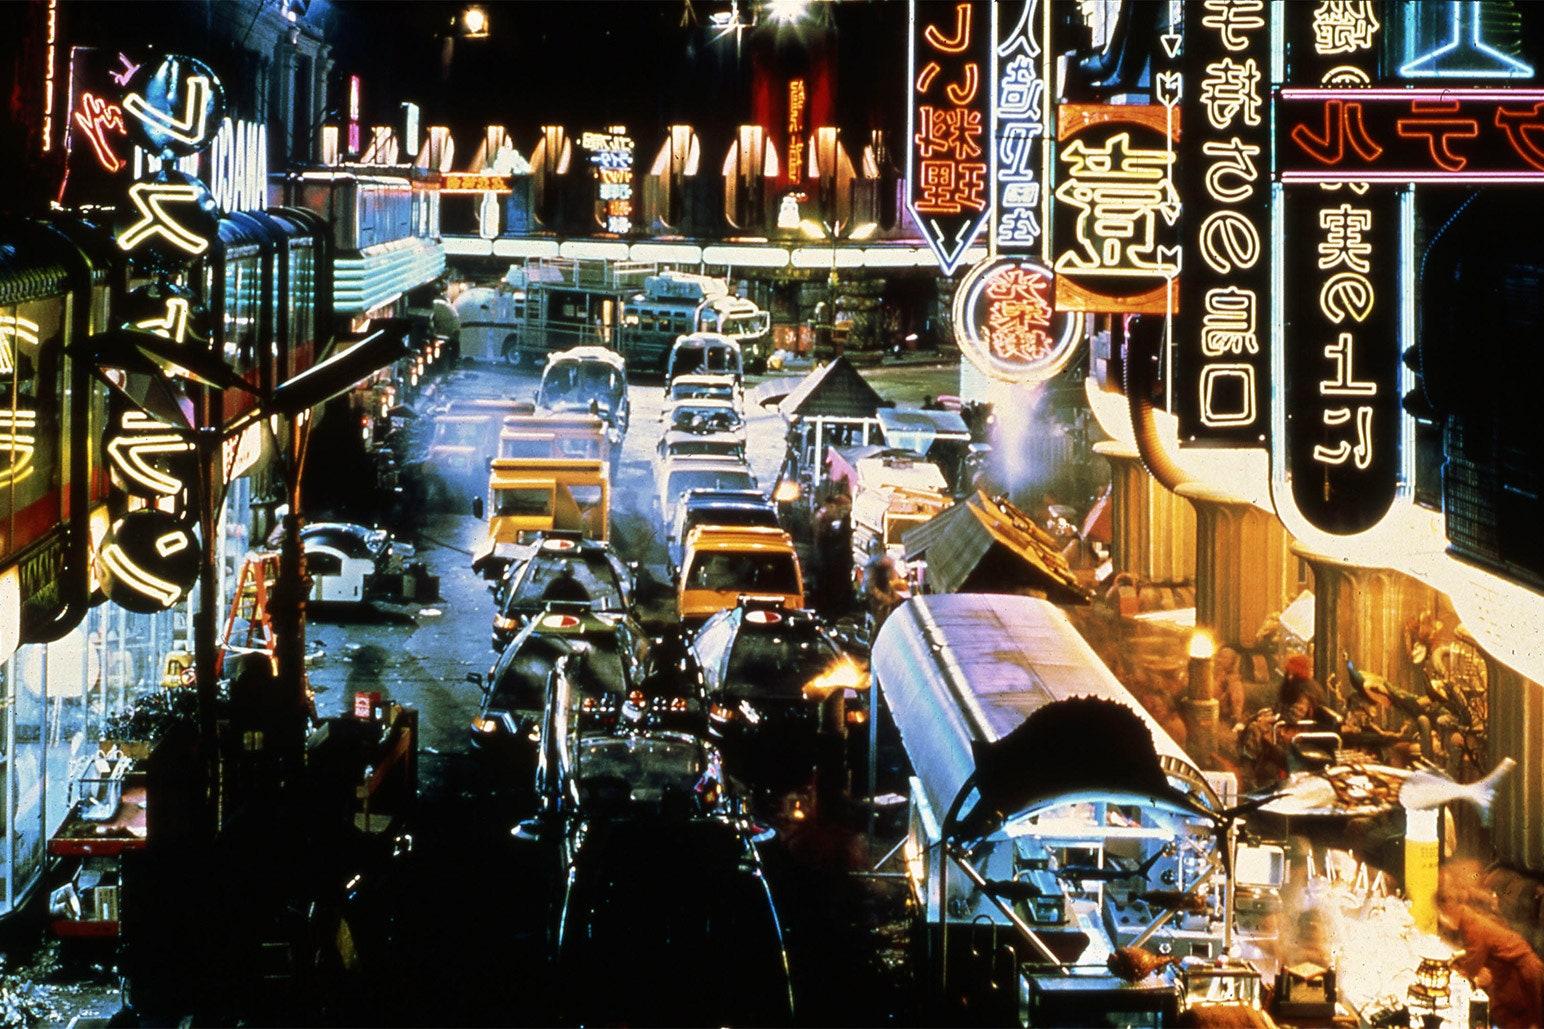 Blade Runner's depiction of San Francisco